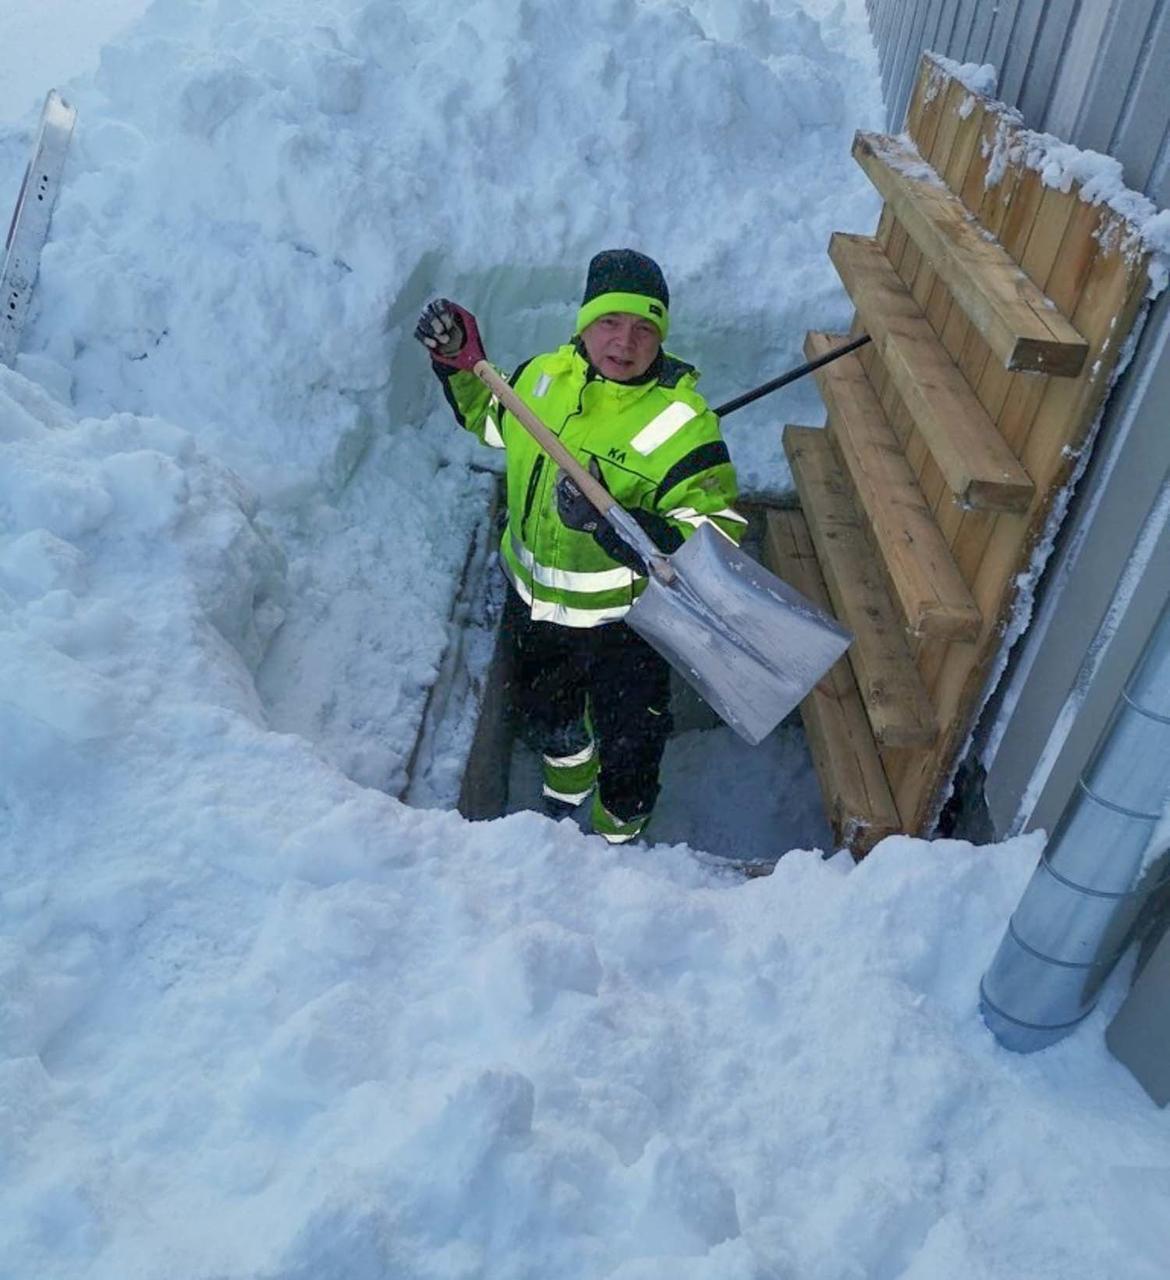 Snow, Slope